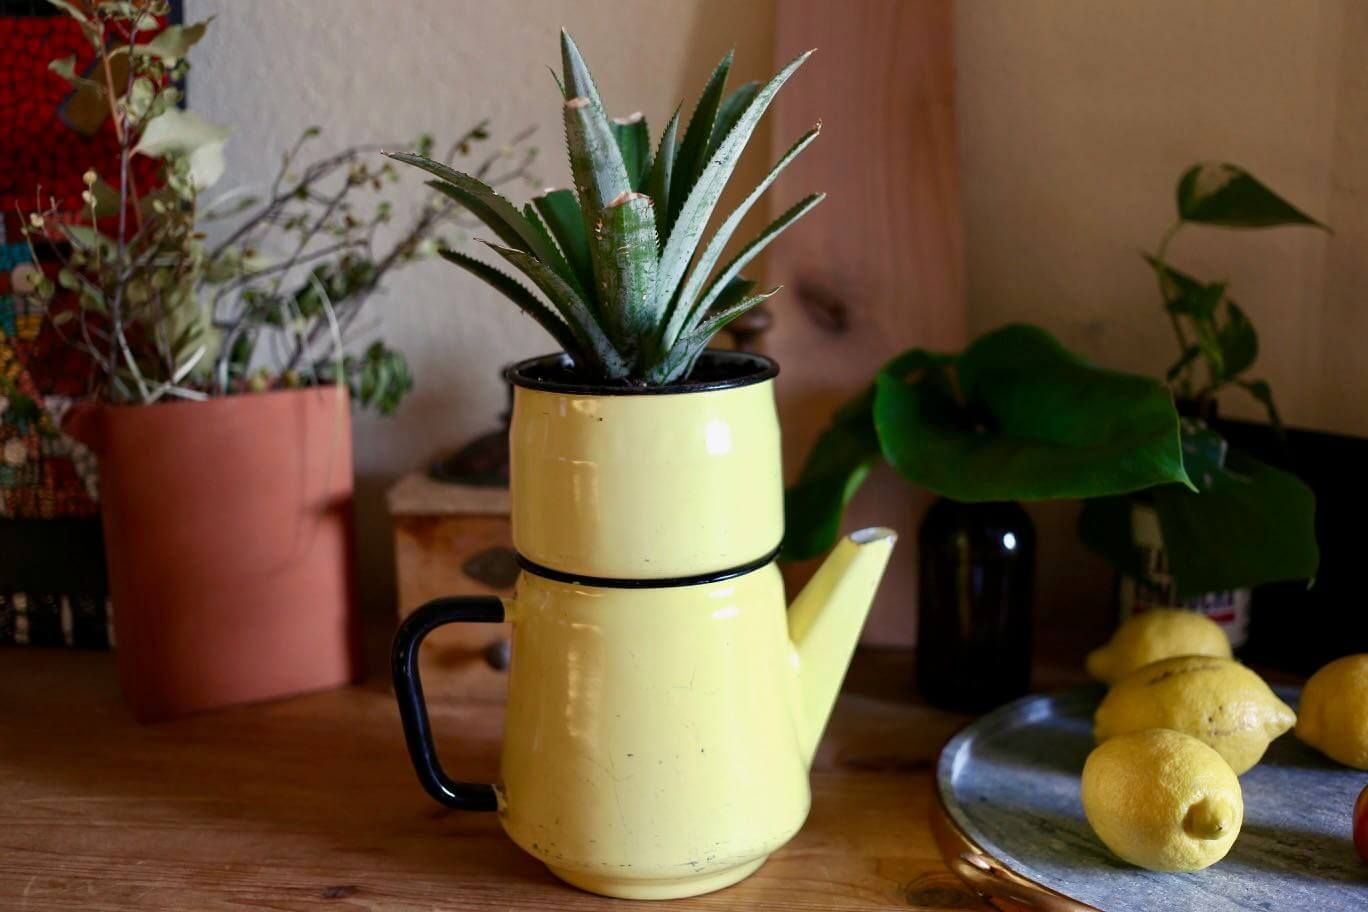 Entretenir Un Pied De Basilic planter et entretenir un ananas: tuto pas à pas | ananas